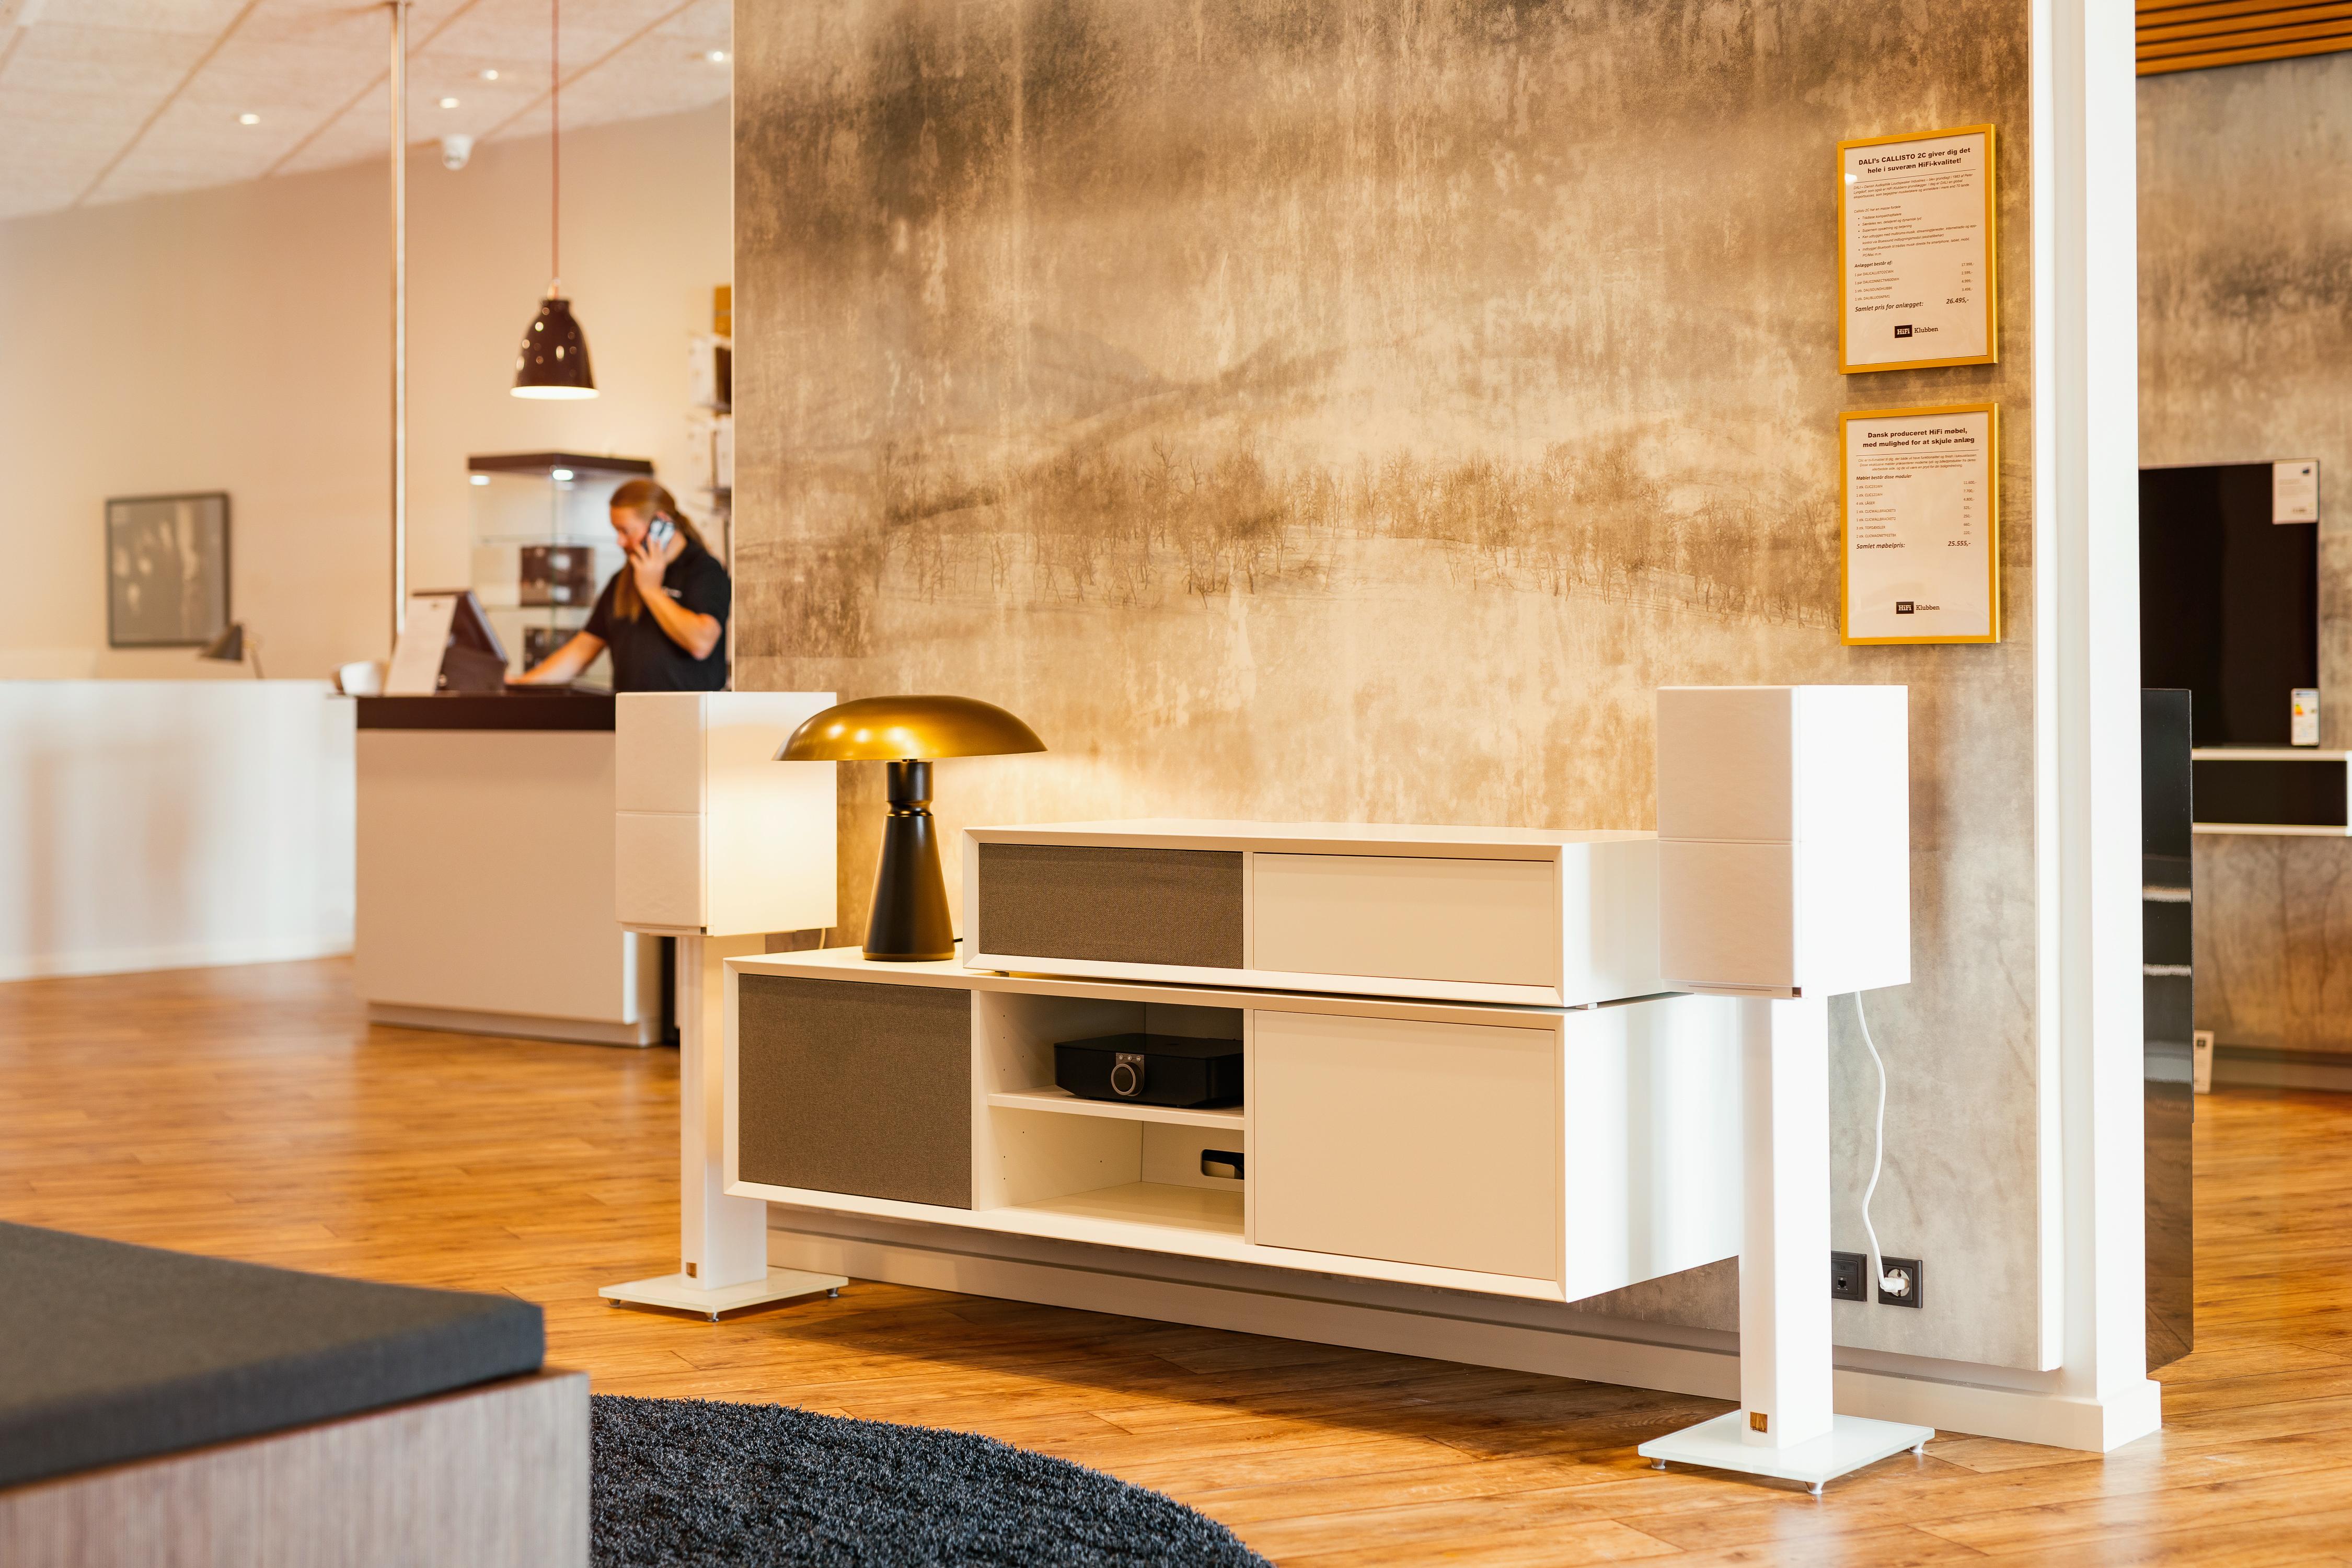 Ny-butik_Aalborg (8).jpg